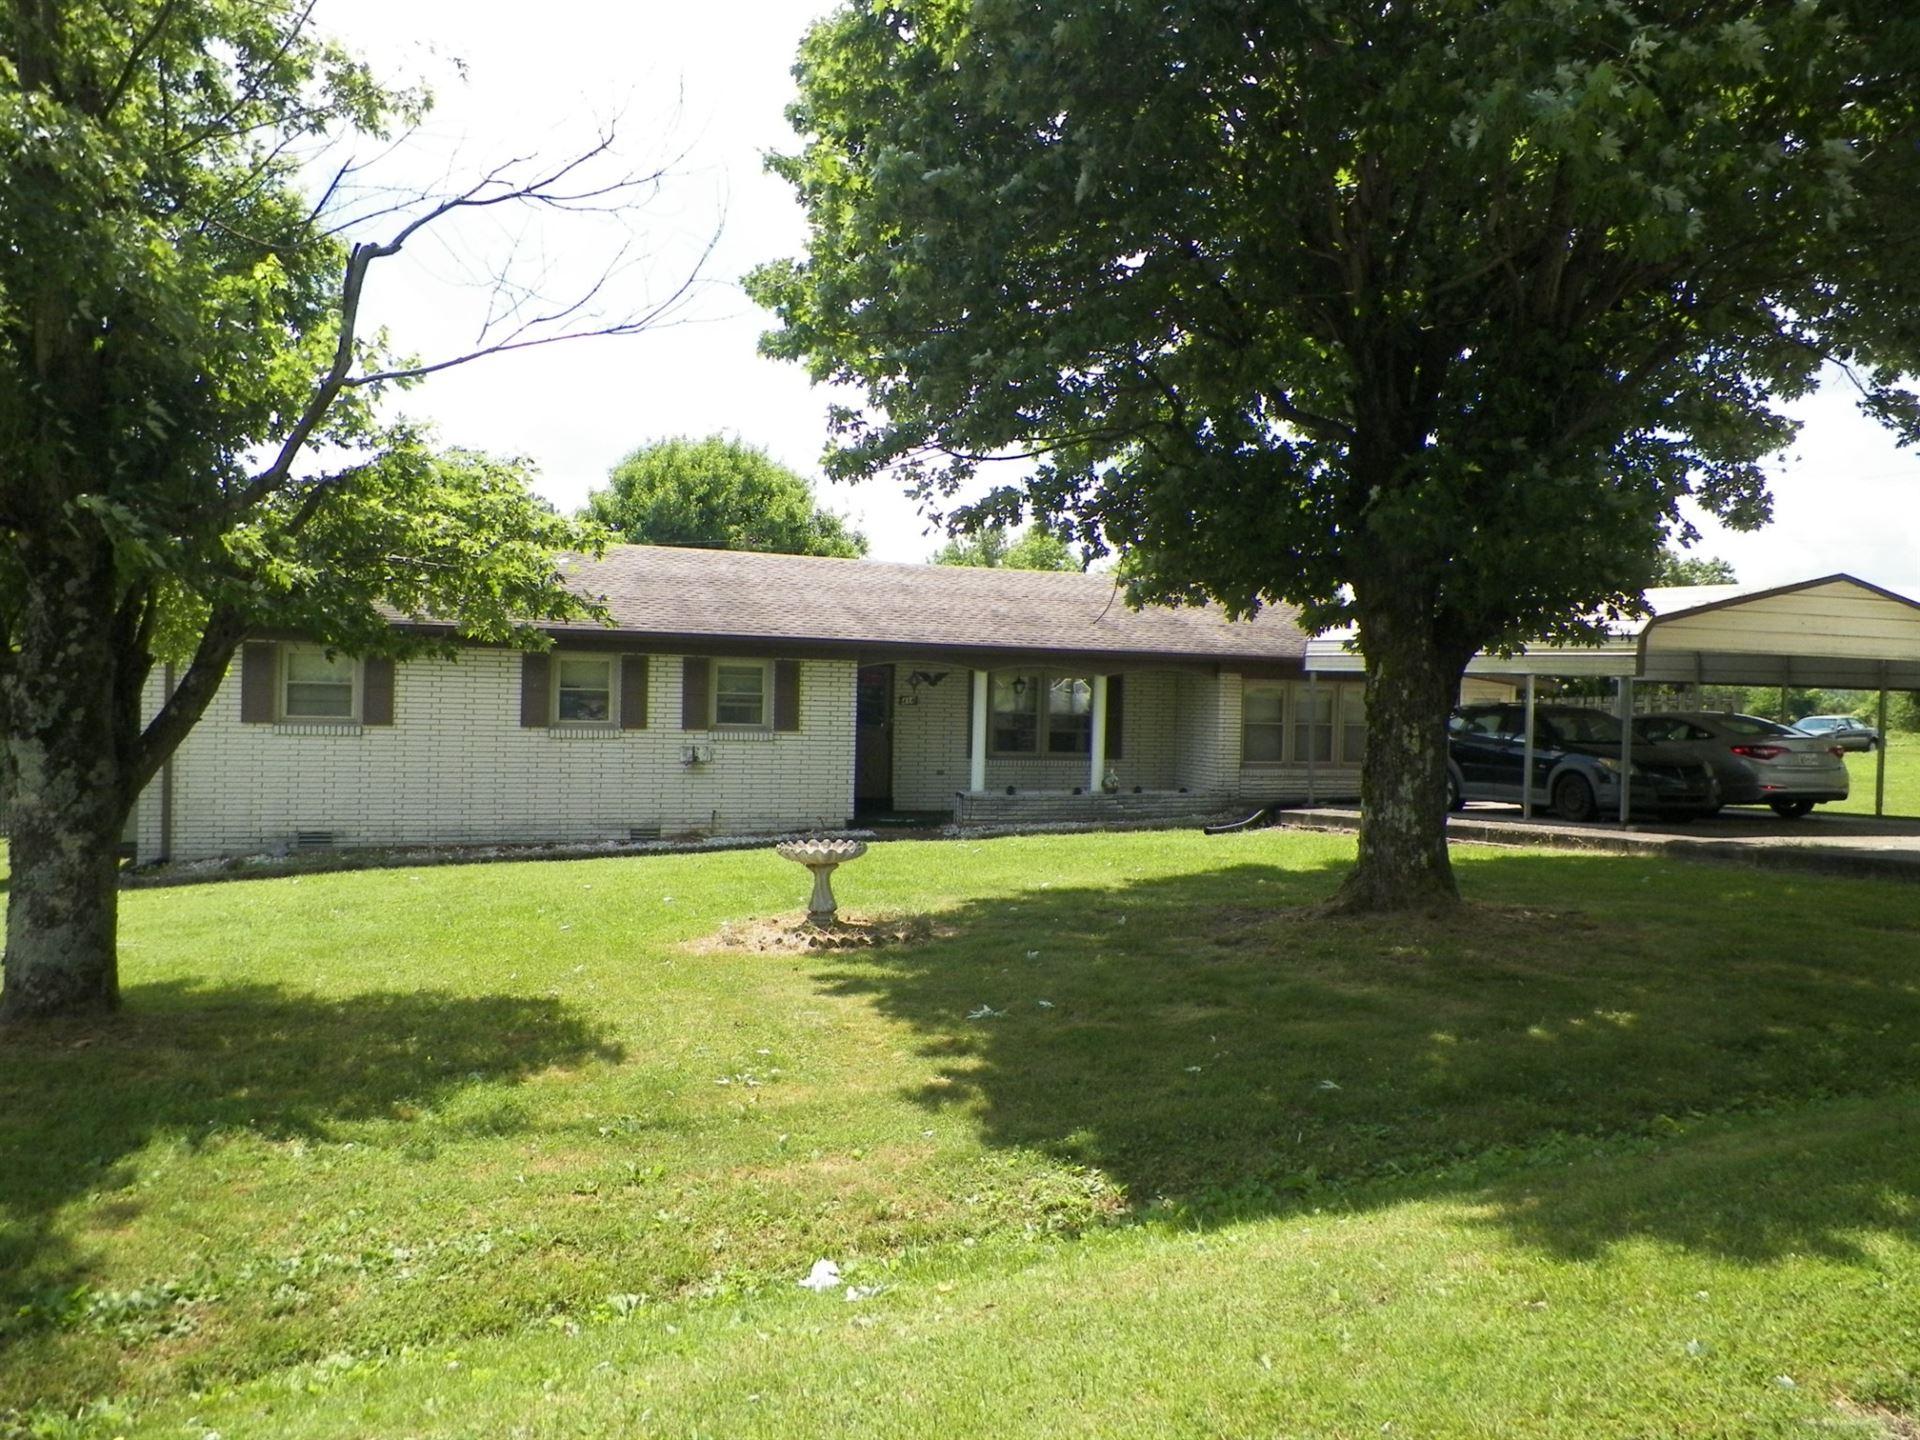 414 Birdwell St, Red Boiling Springs, TN 37150 - MLS#: 2266947